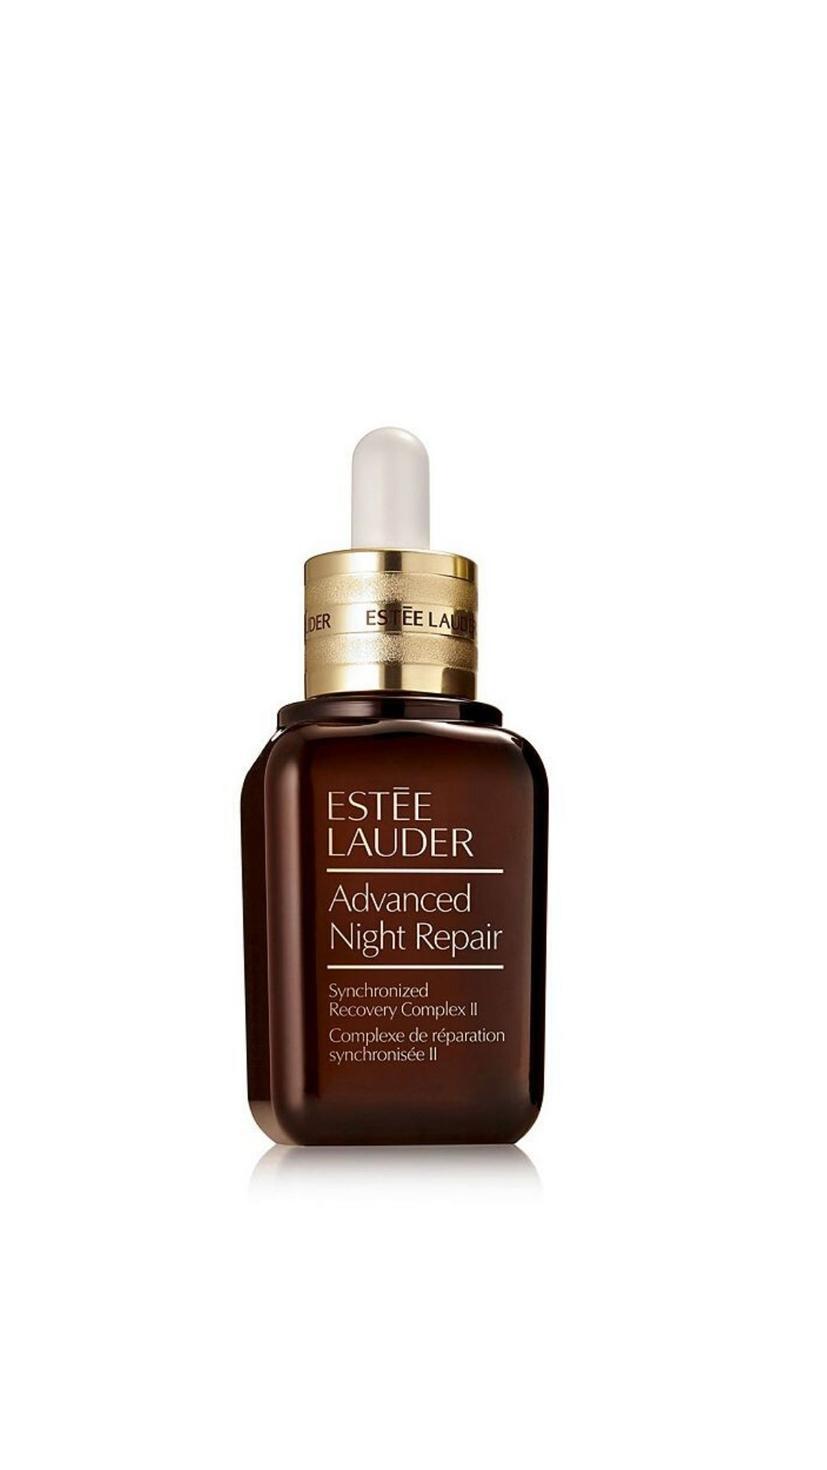 Beauty Oils, Night Oils, Skincare, Facial Oil, Estee Lauder, Kiehls, Best Facial Oils, Night oils for face